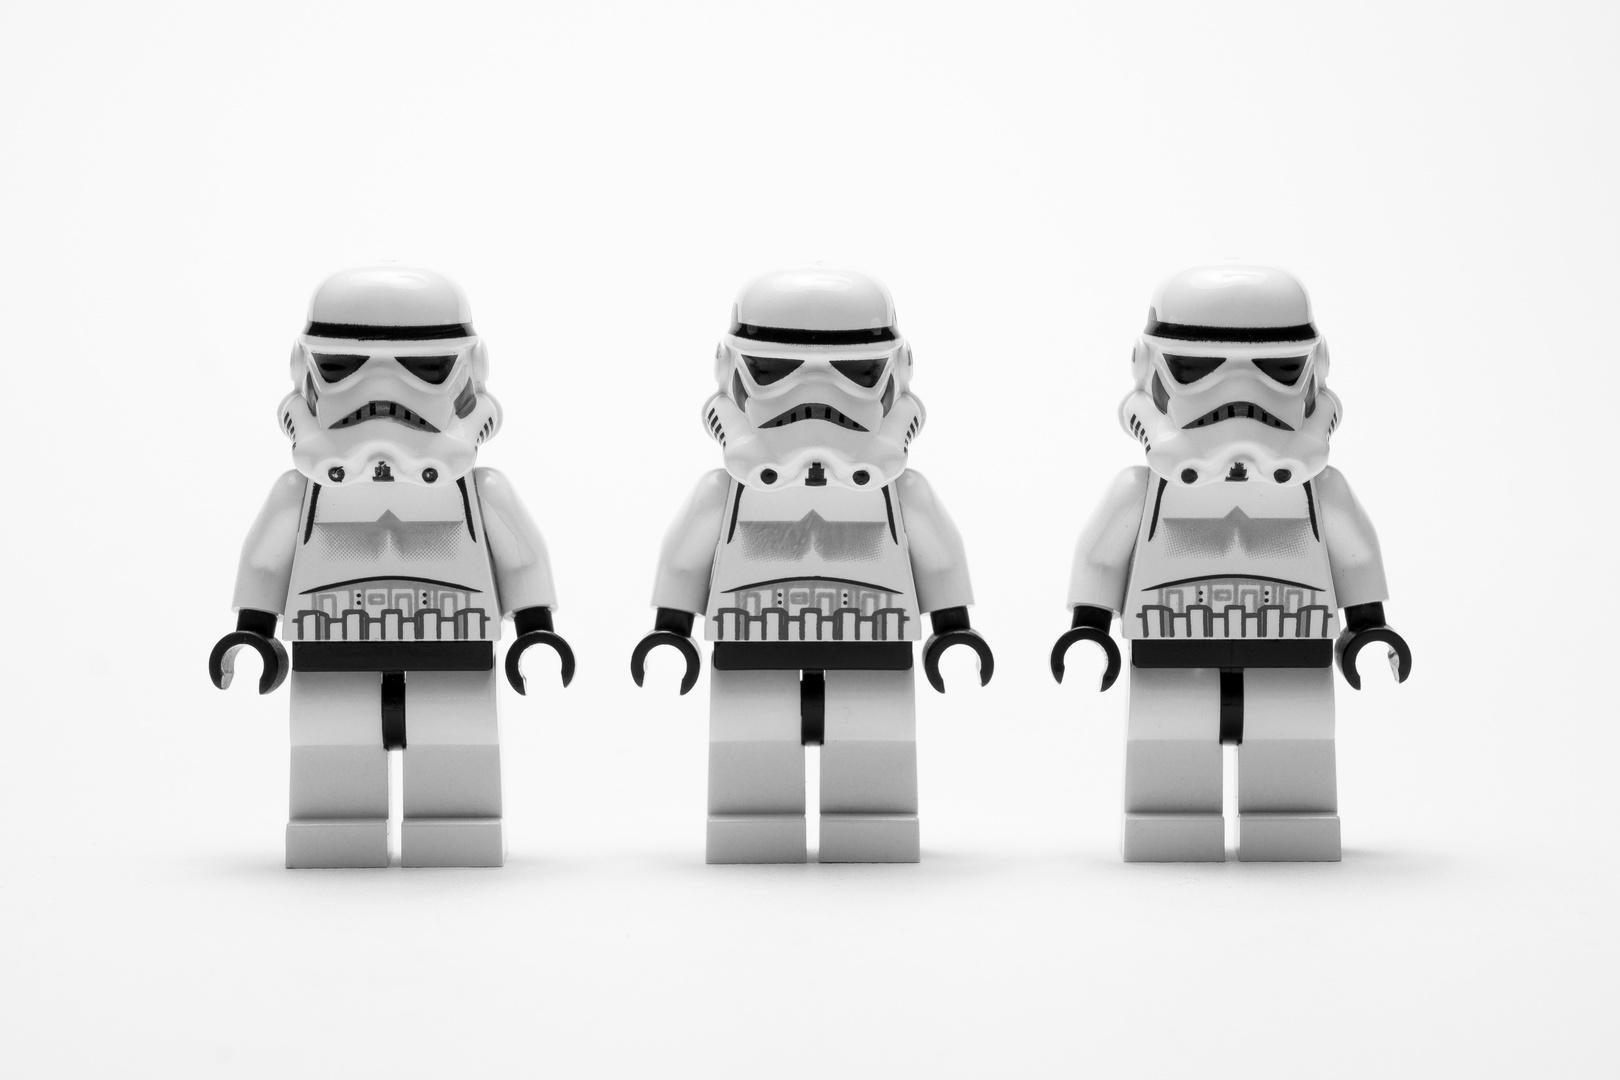 tres hombres imperiales